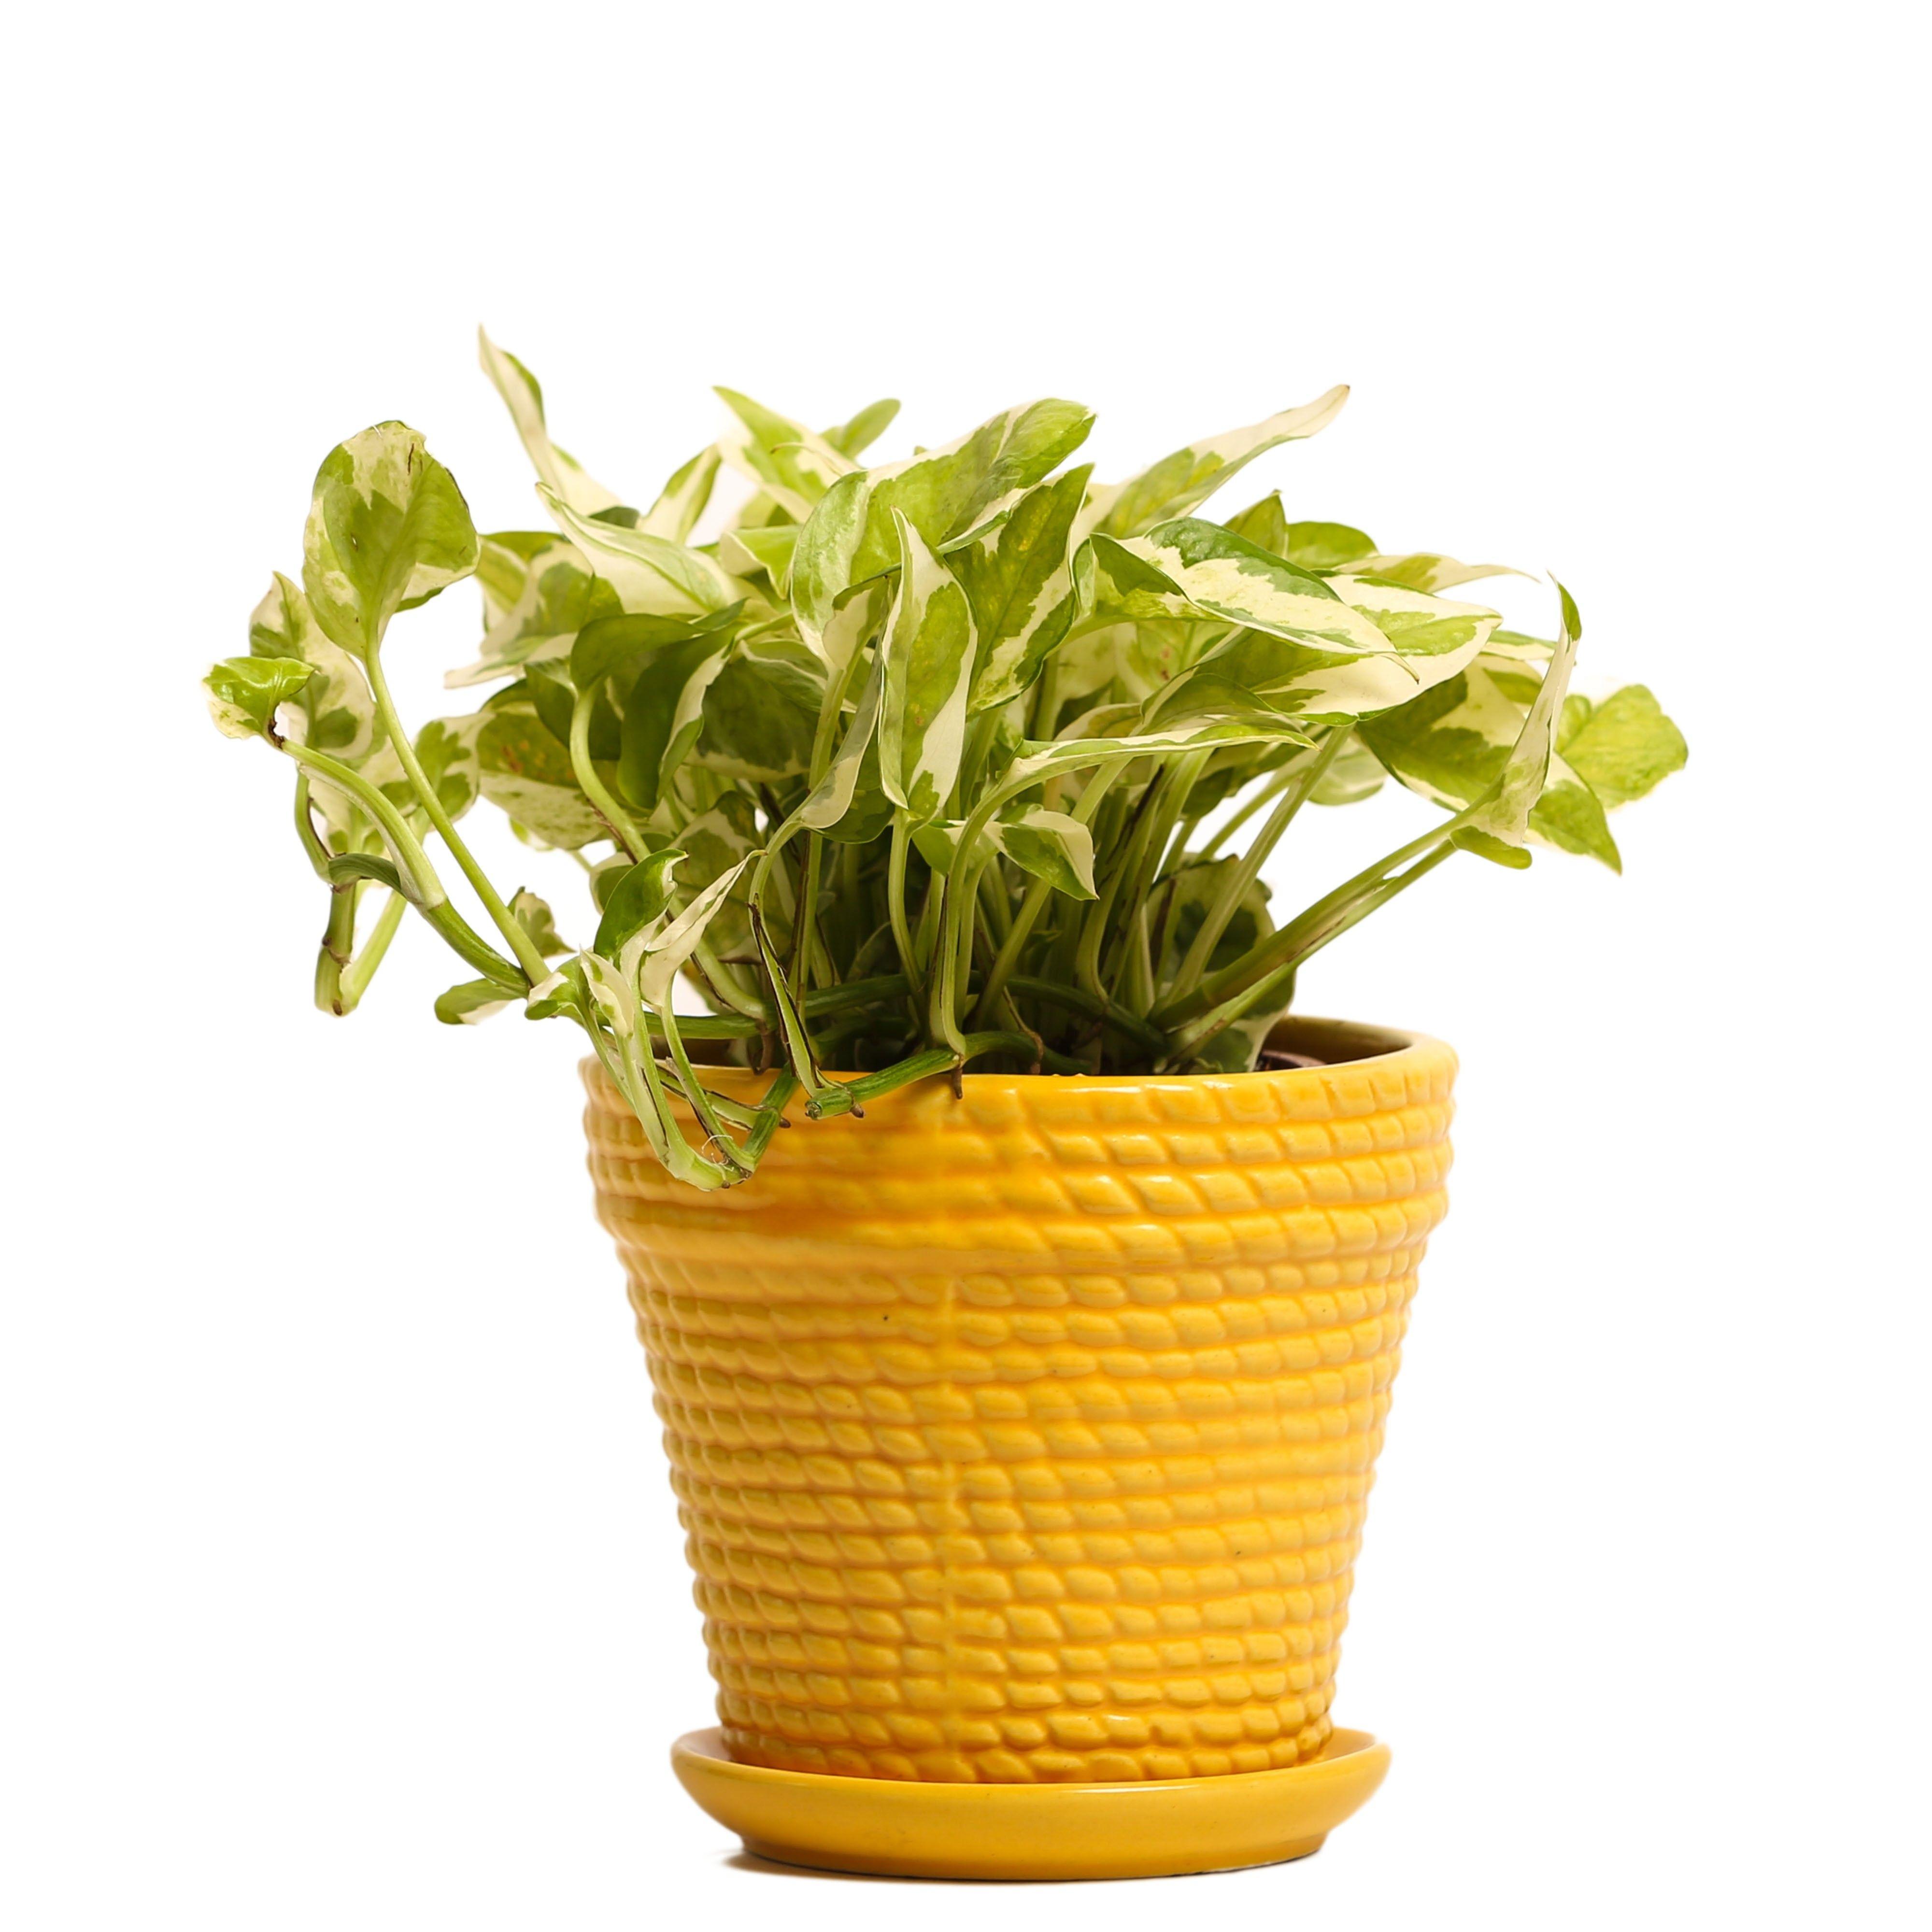 NG- Indoor Plant White Pothos Yellow Ceramic Pot